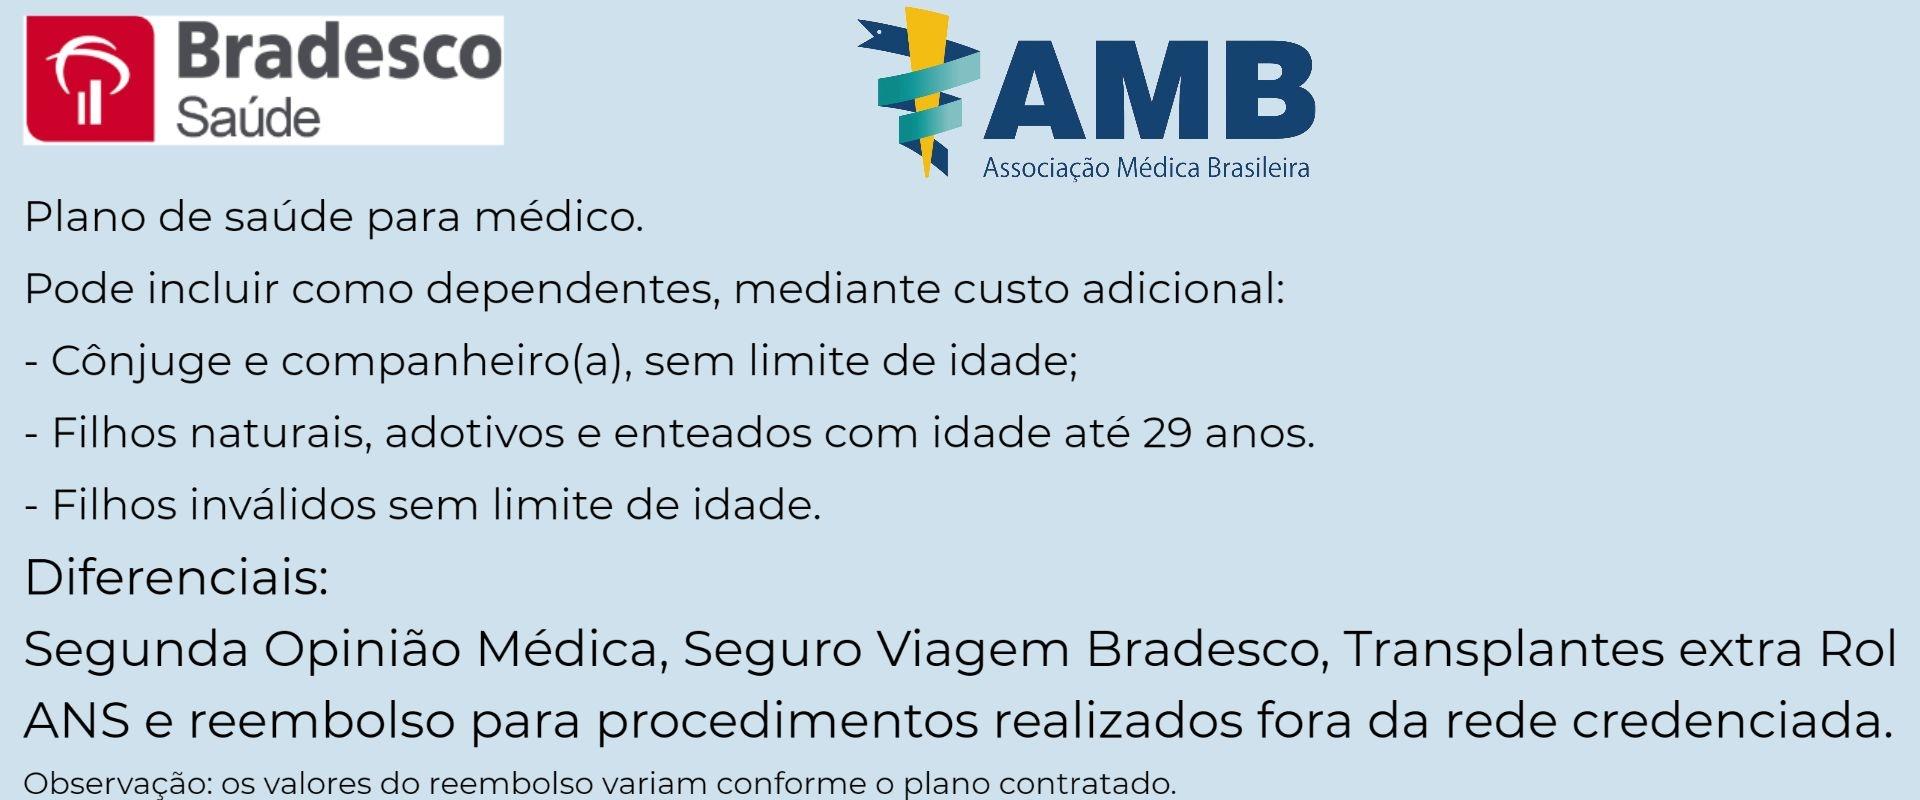 Bradesco Saúde AMB-ES